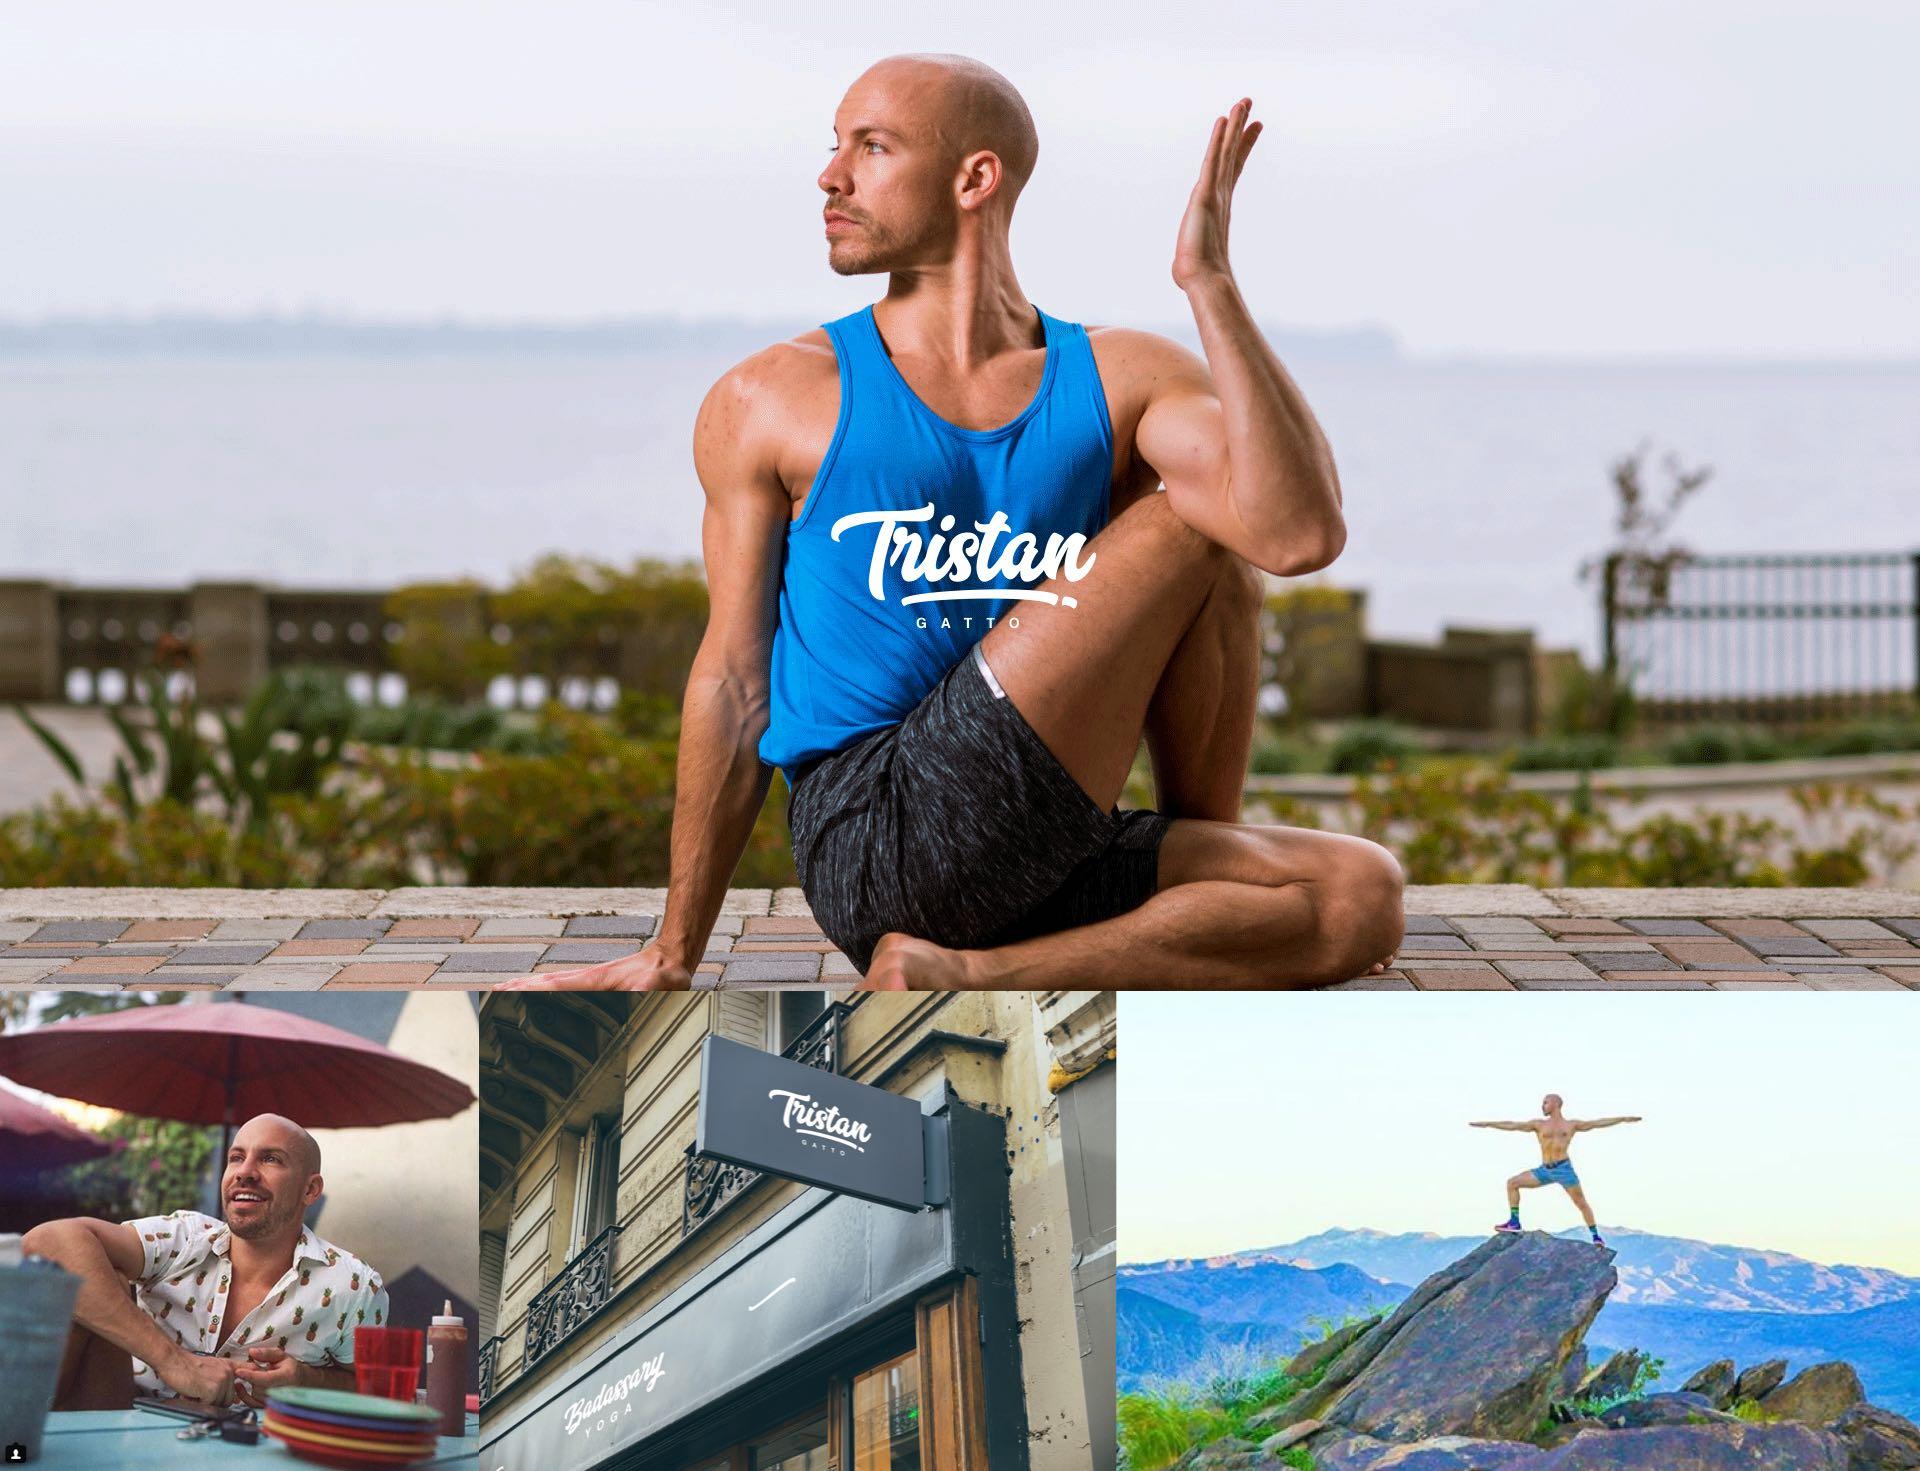 tristan gatto yoga brand identity yeti clients